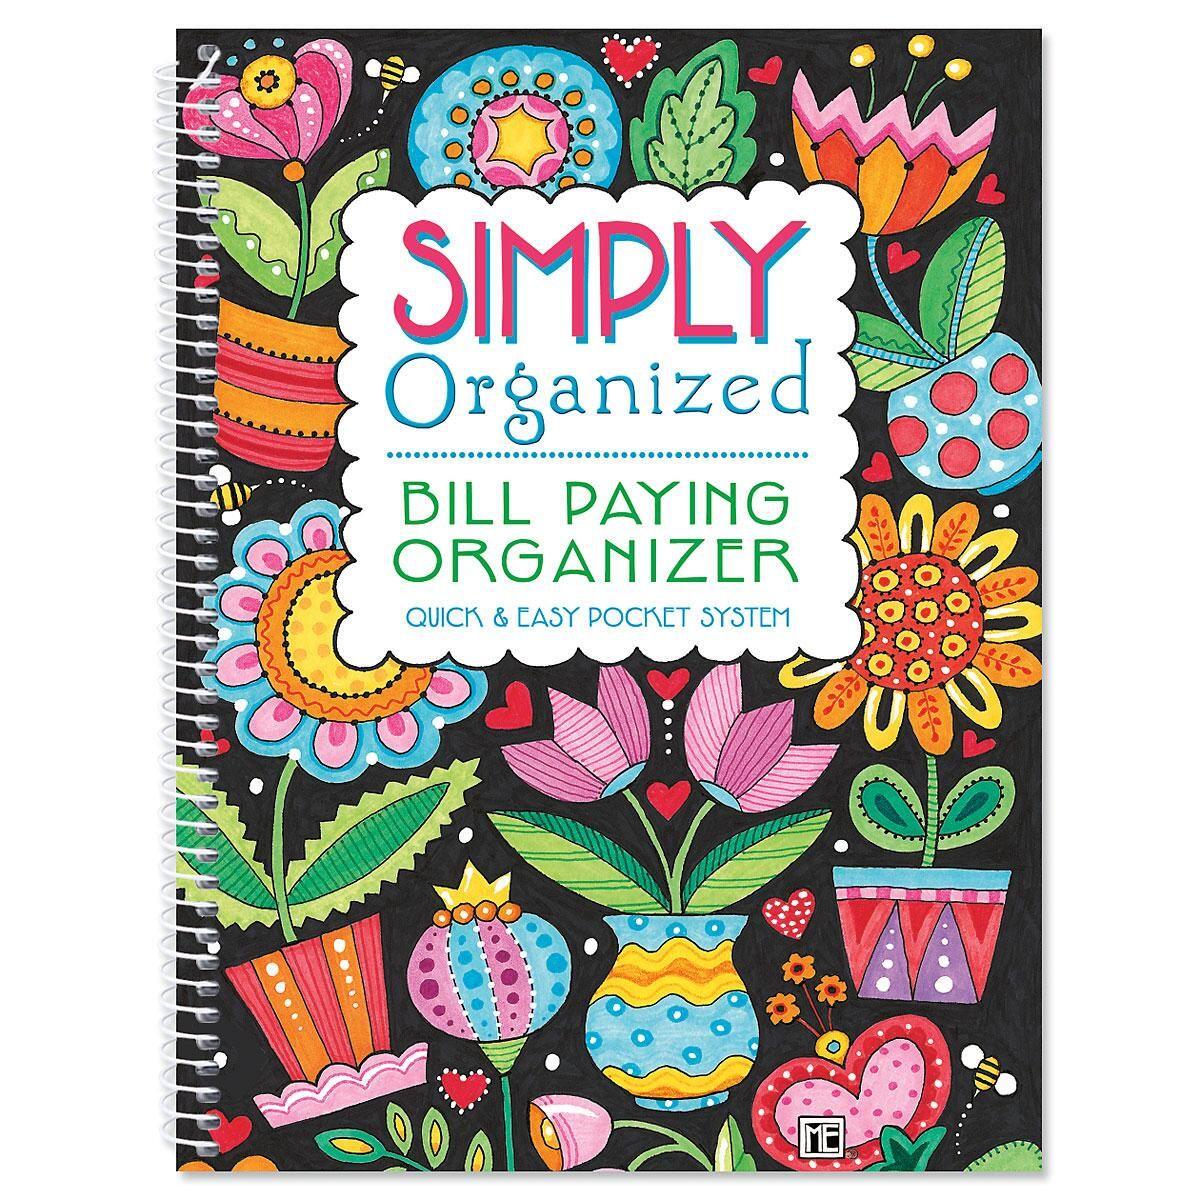 Bill Paying Organizer by Mary Engelbreit®